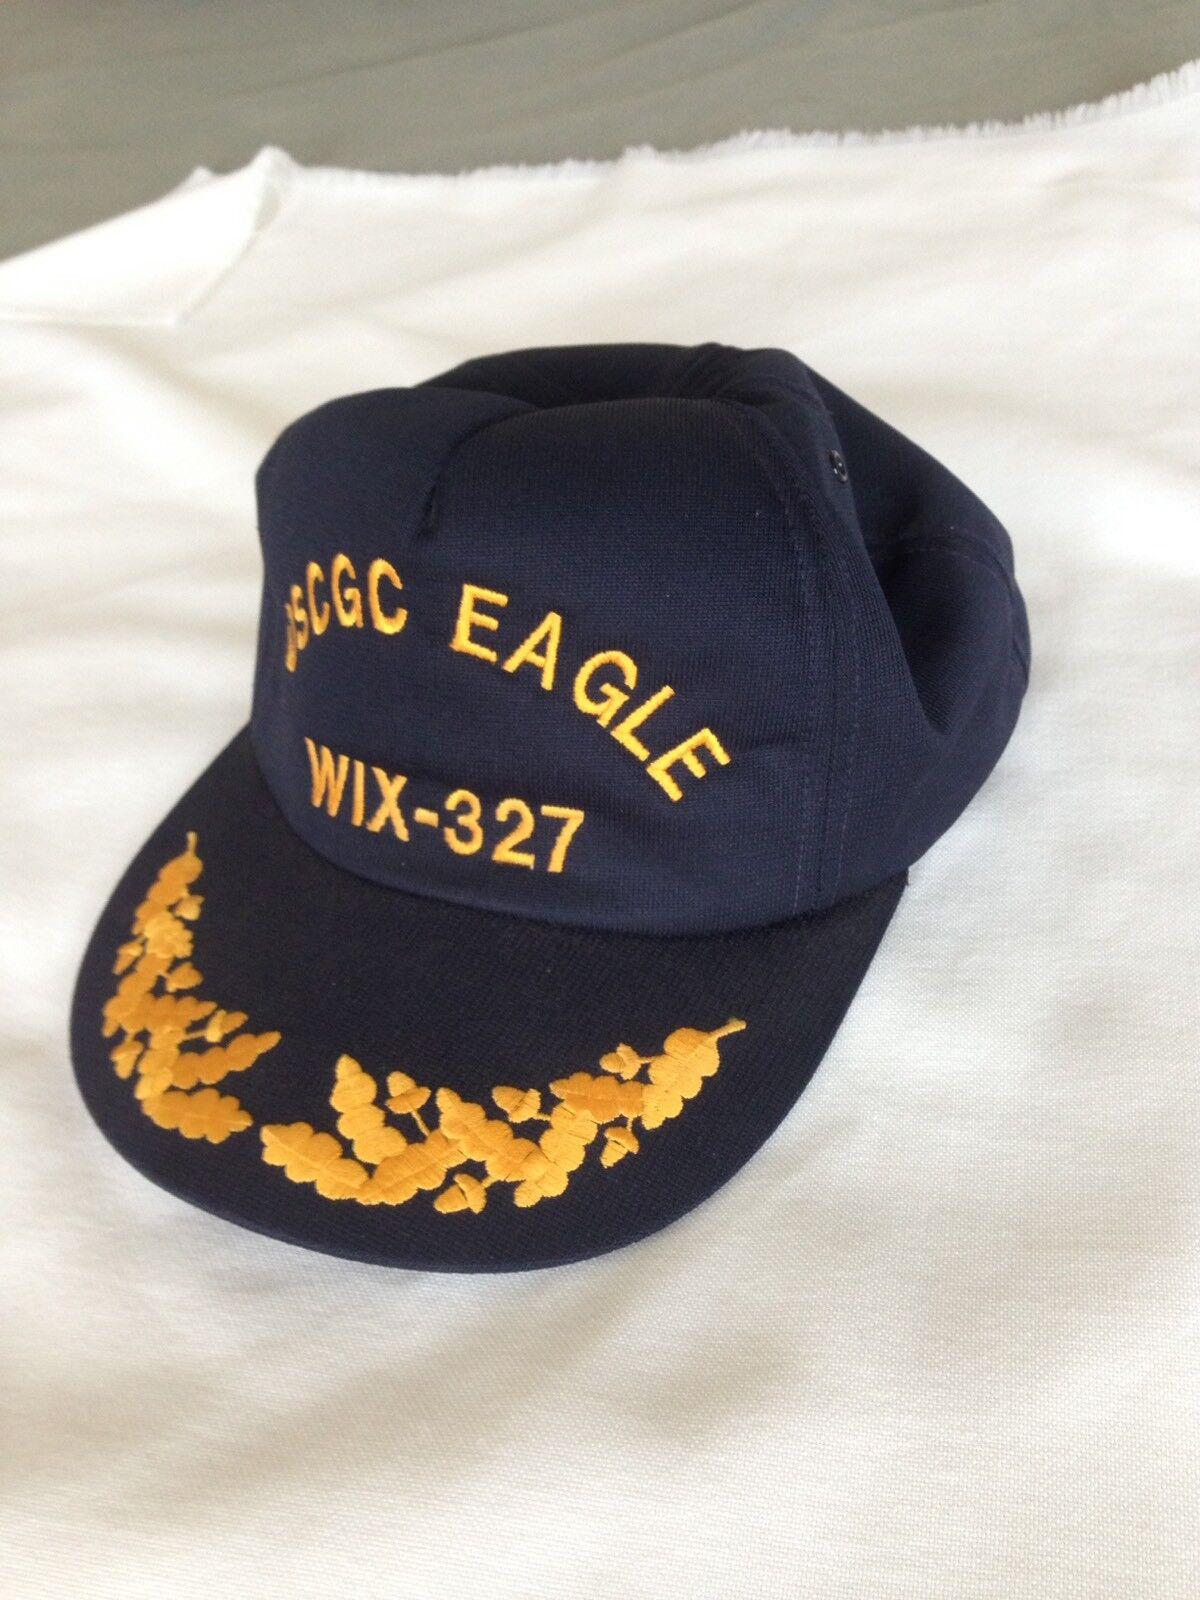 USCGC One Eagle WIX-327 USA Made One USCGC Size Snap Back Trucker Baseball Cap aa8091